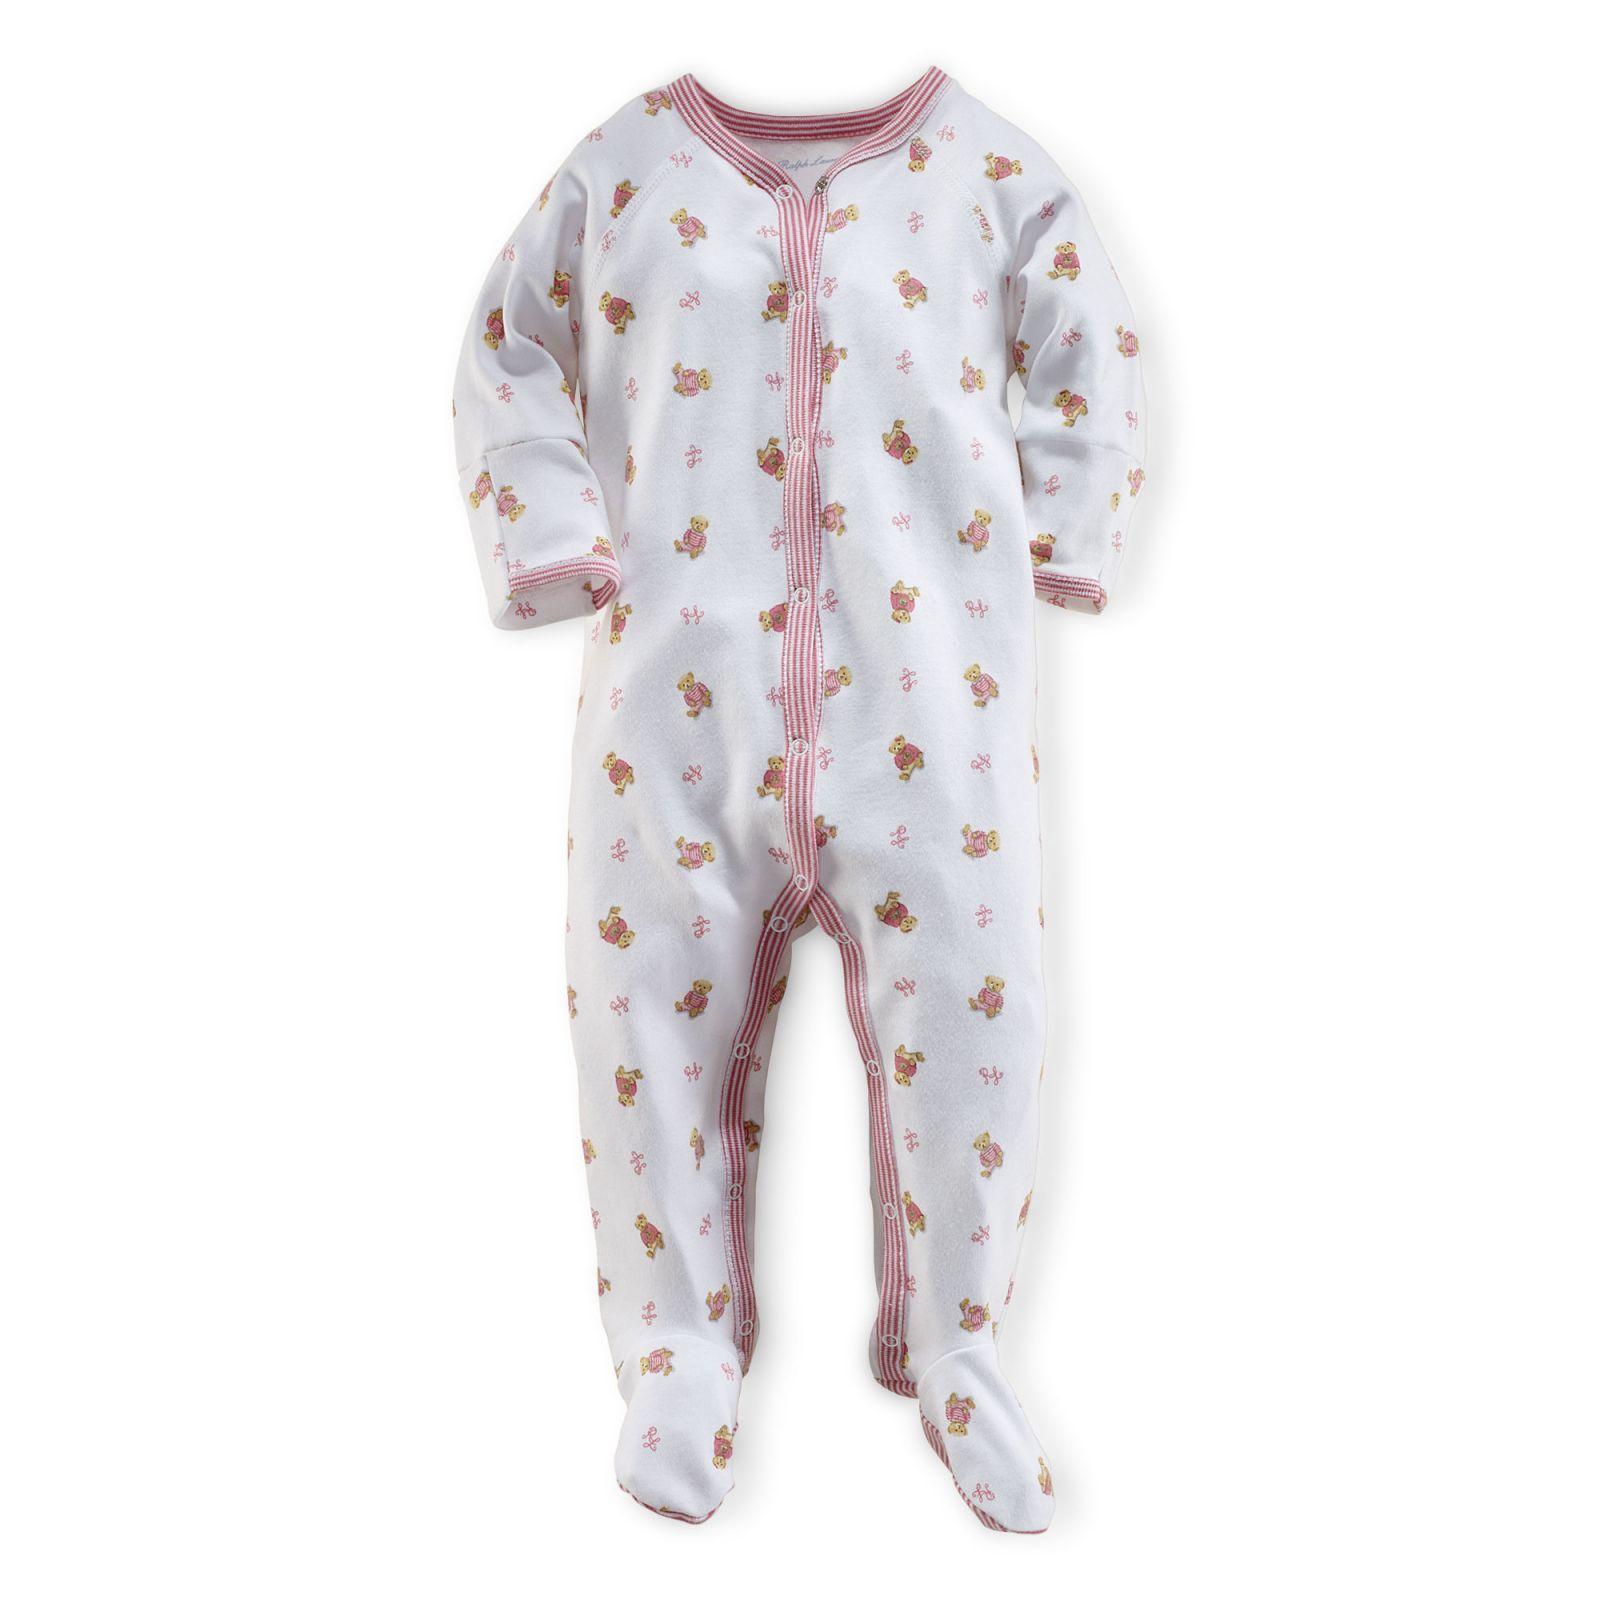 Ralph Lauren oblečení pro miminko Bear-Print Coverall